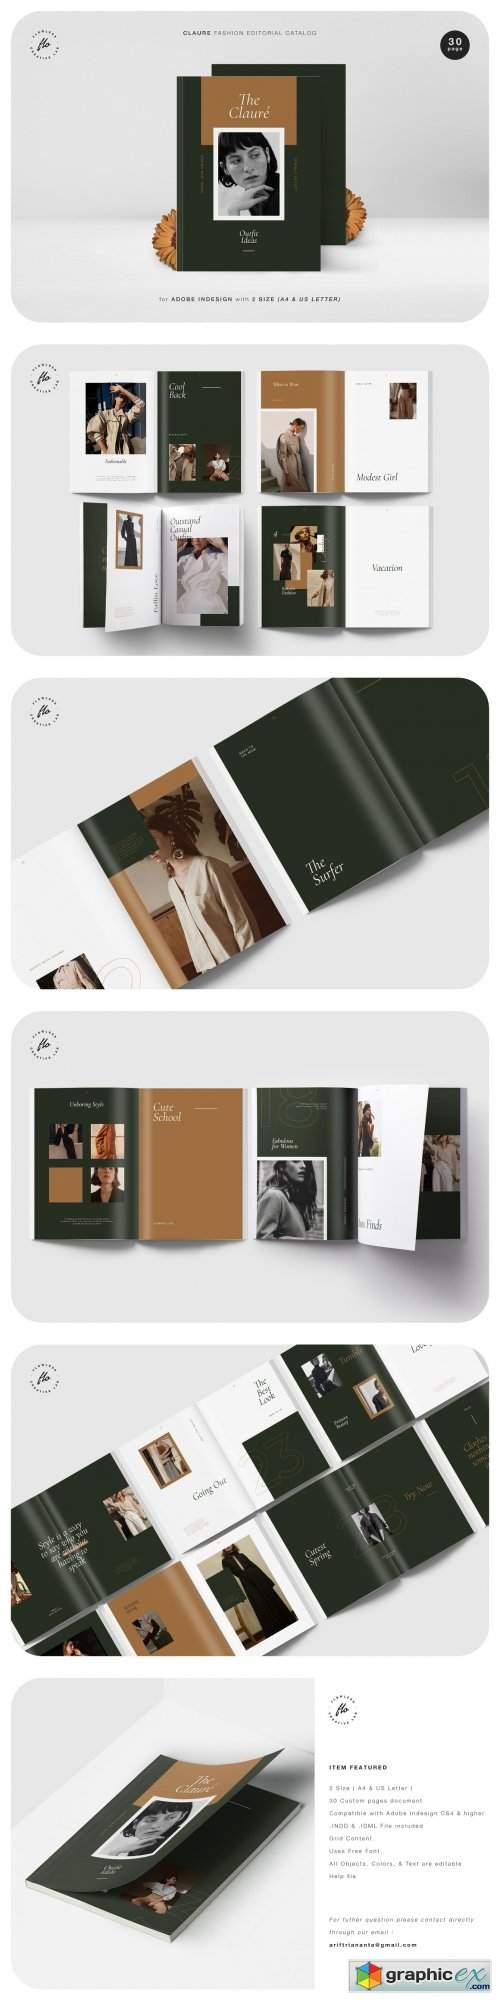 CLAURE Fashion Editorial Catalog